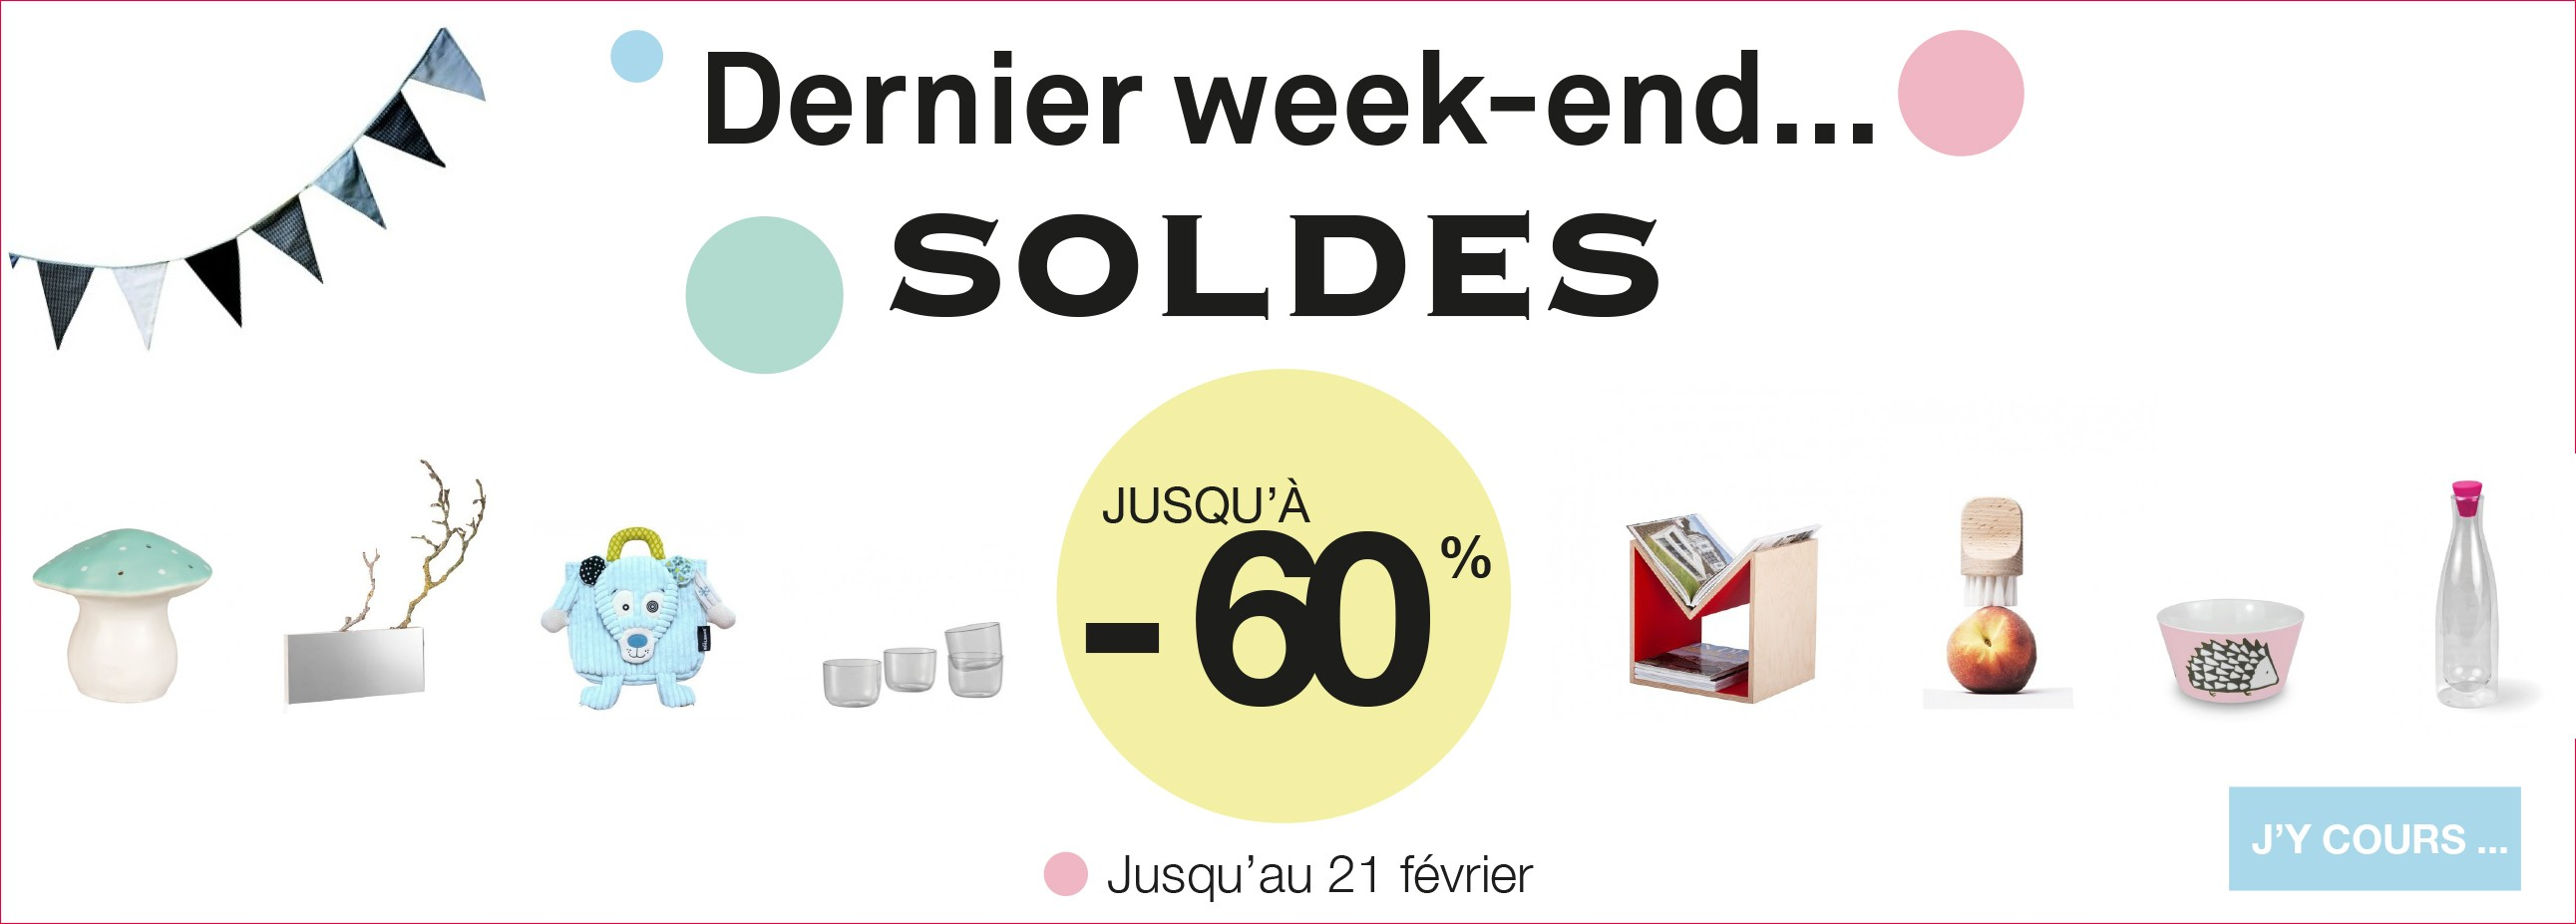 Soldes LaCorbeille.fr janvier 2017